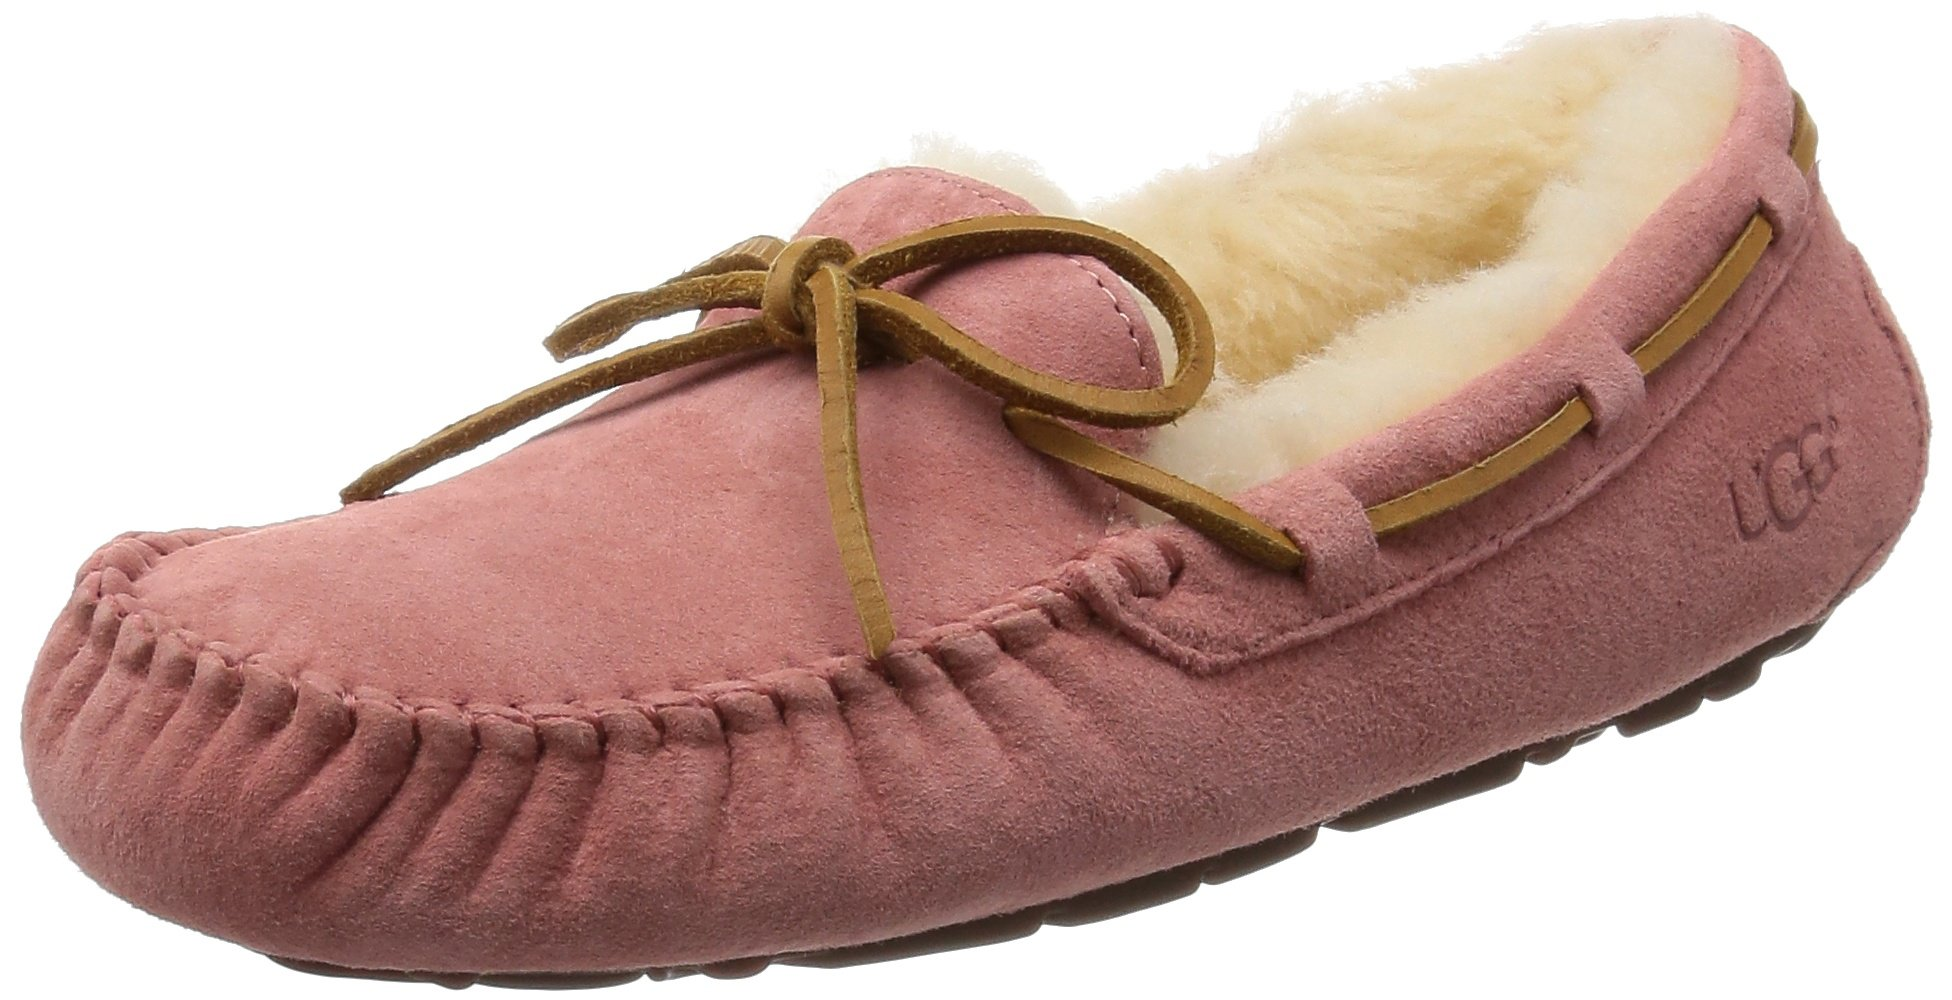 a72478aaa56 UGG Womens Dakota Slippers Chemise Pink Size 5